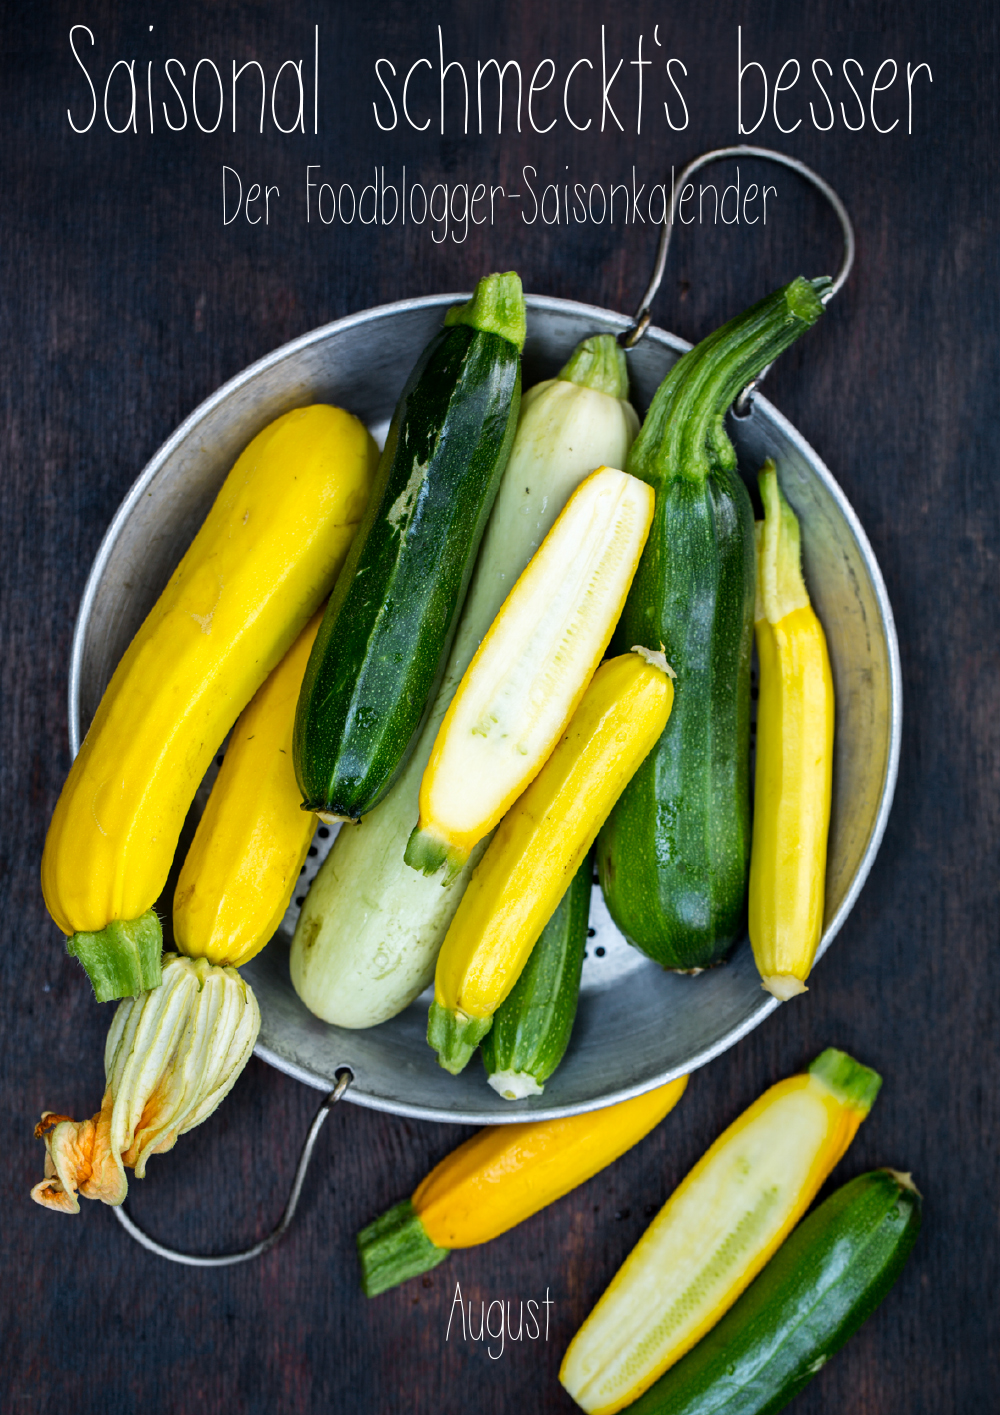 Saisonal-schmeckts-besser-august